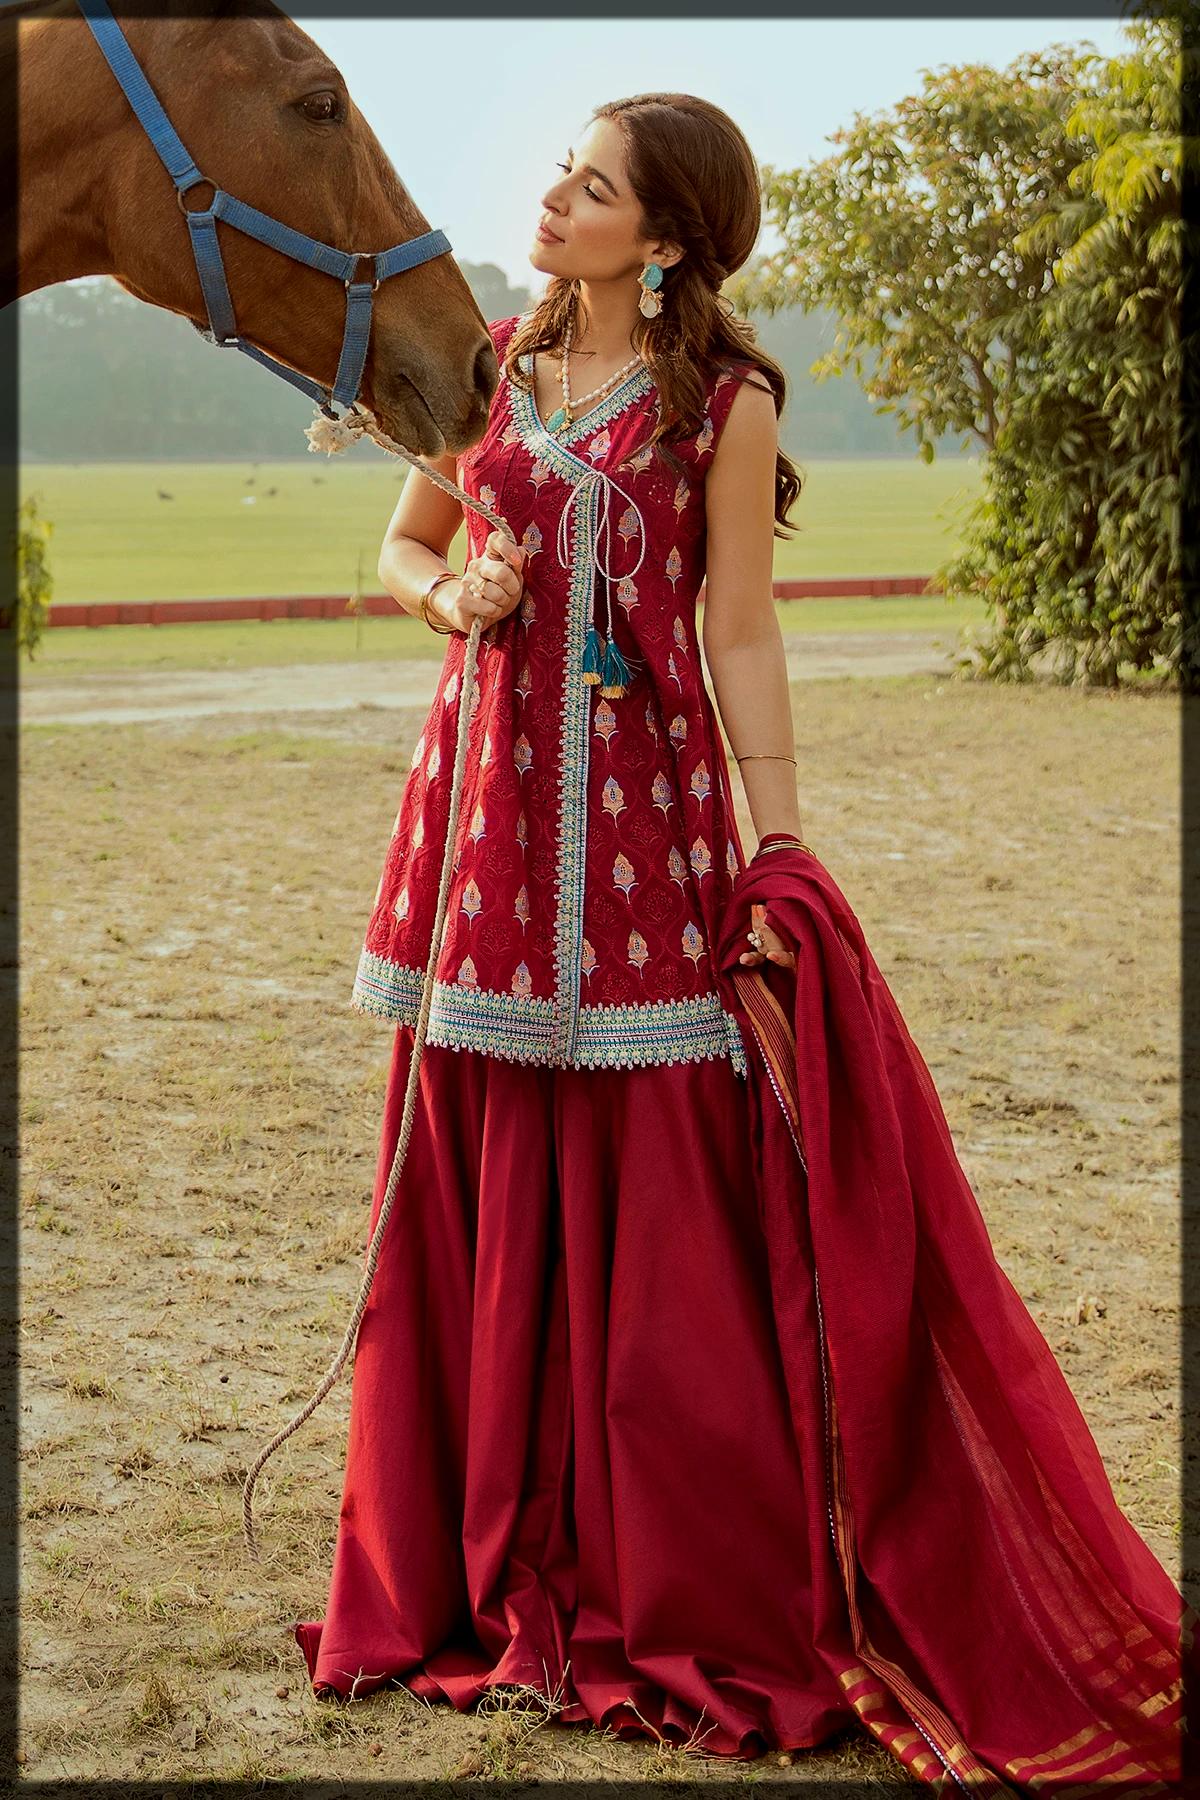 Classy Maroon Luxury suit by Saira Rizwan